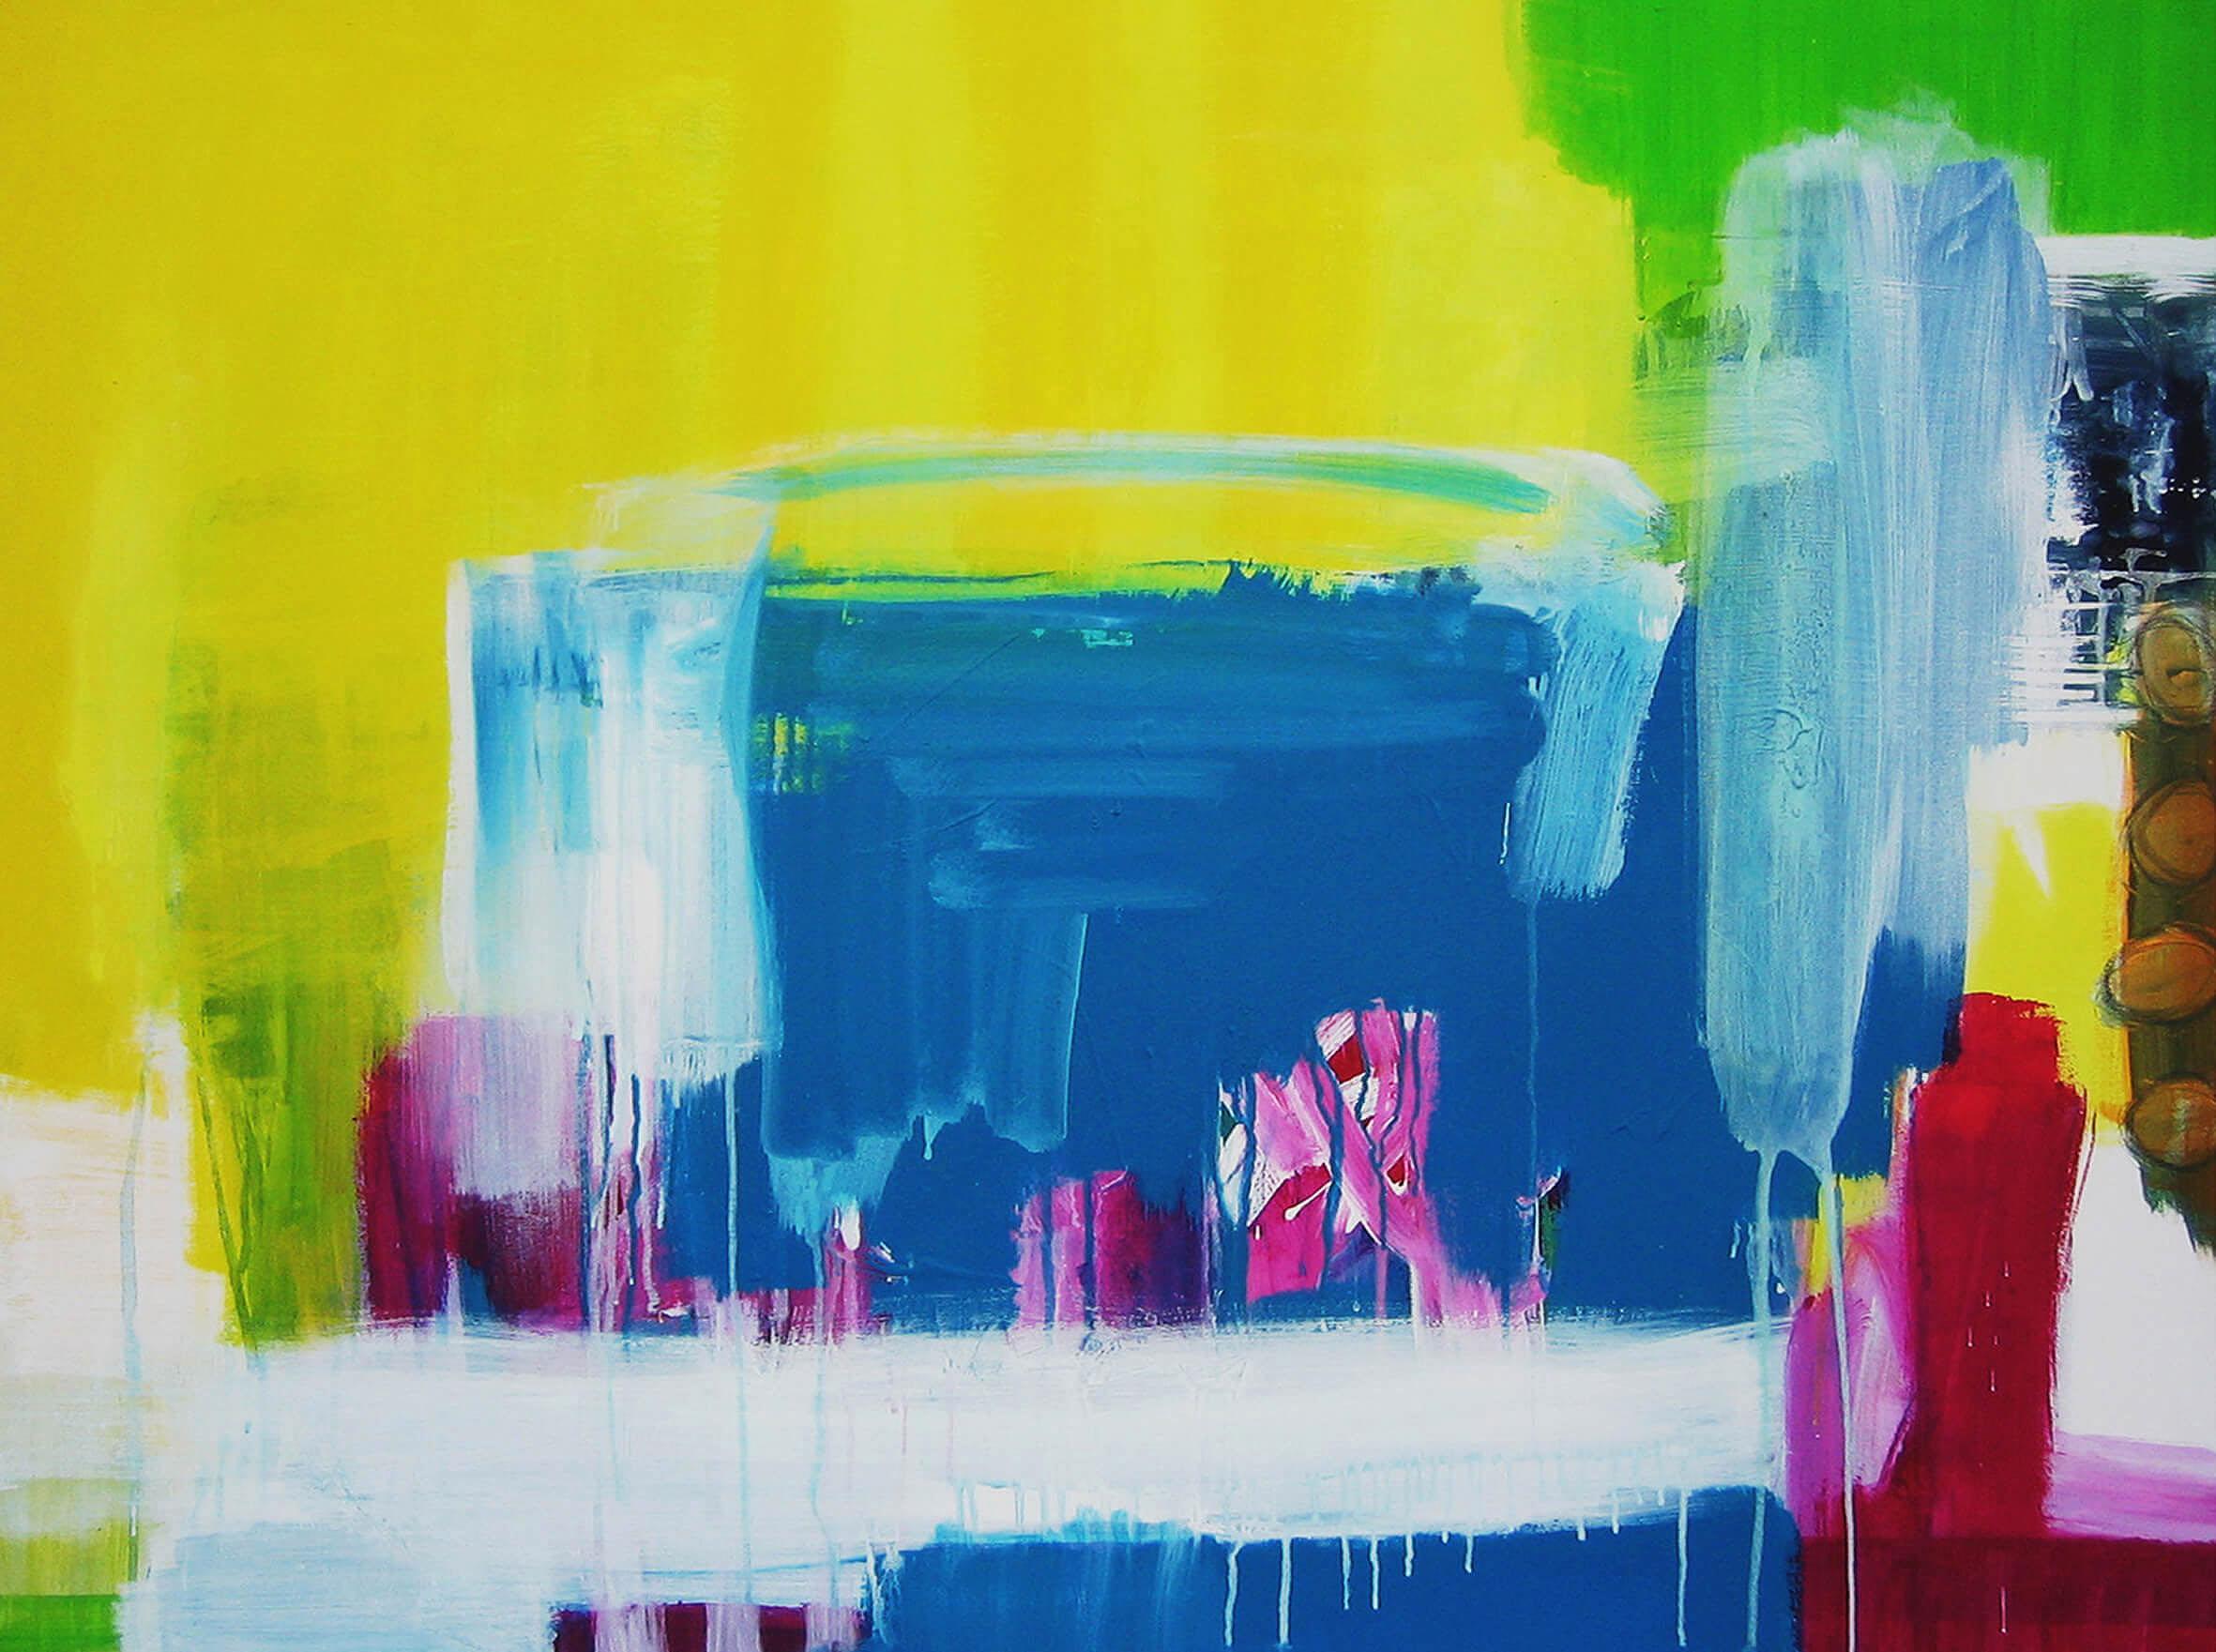 spirit artwork abstract expressive canvas